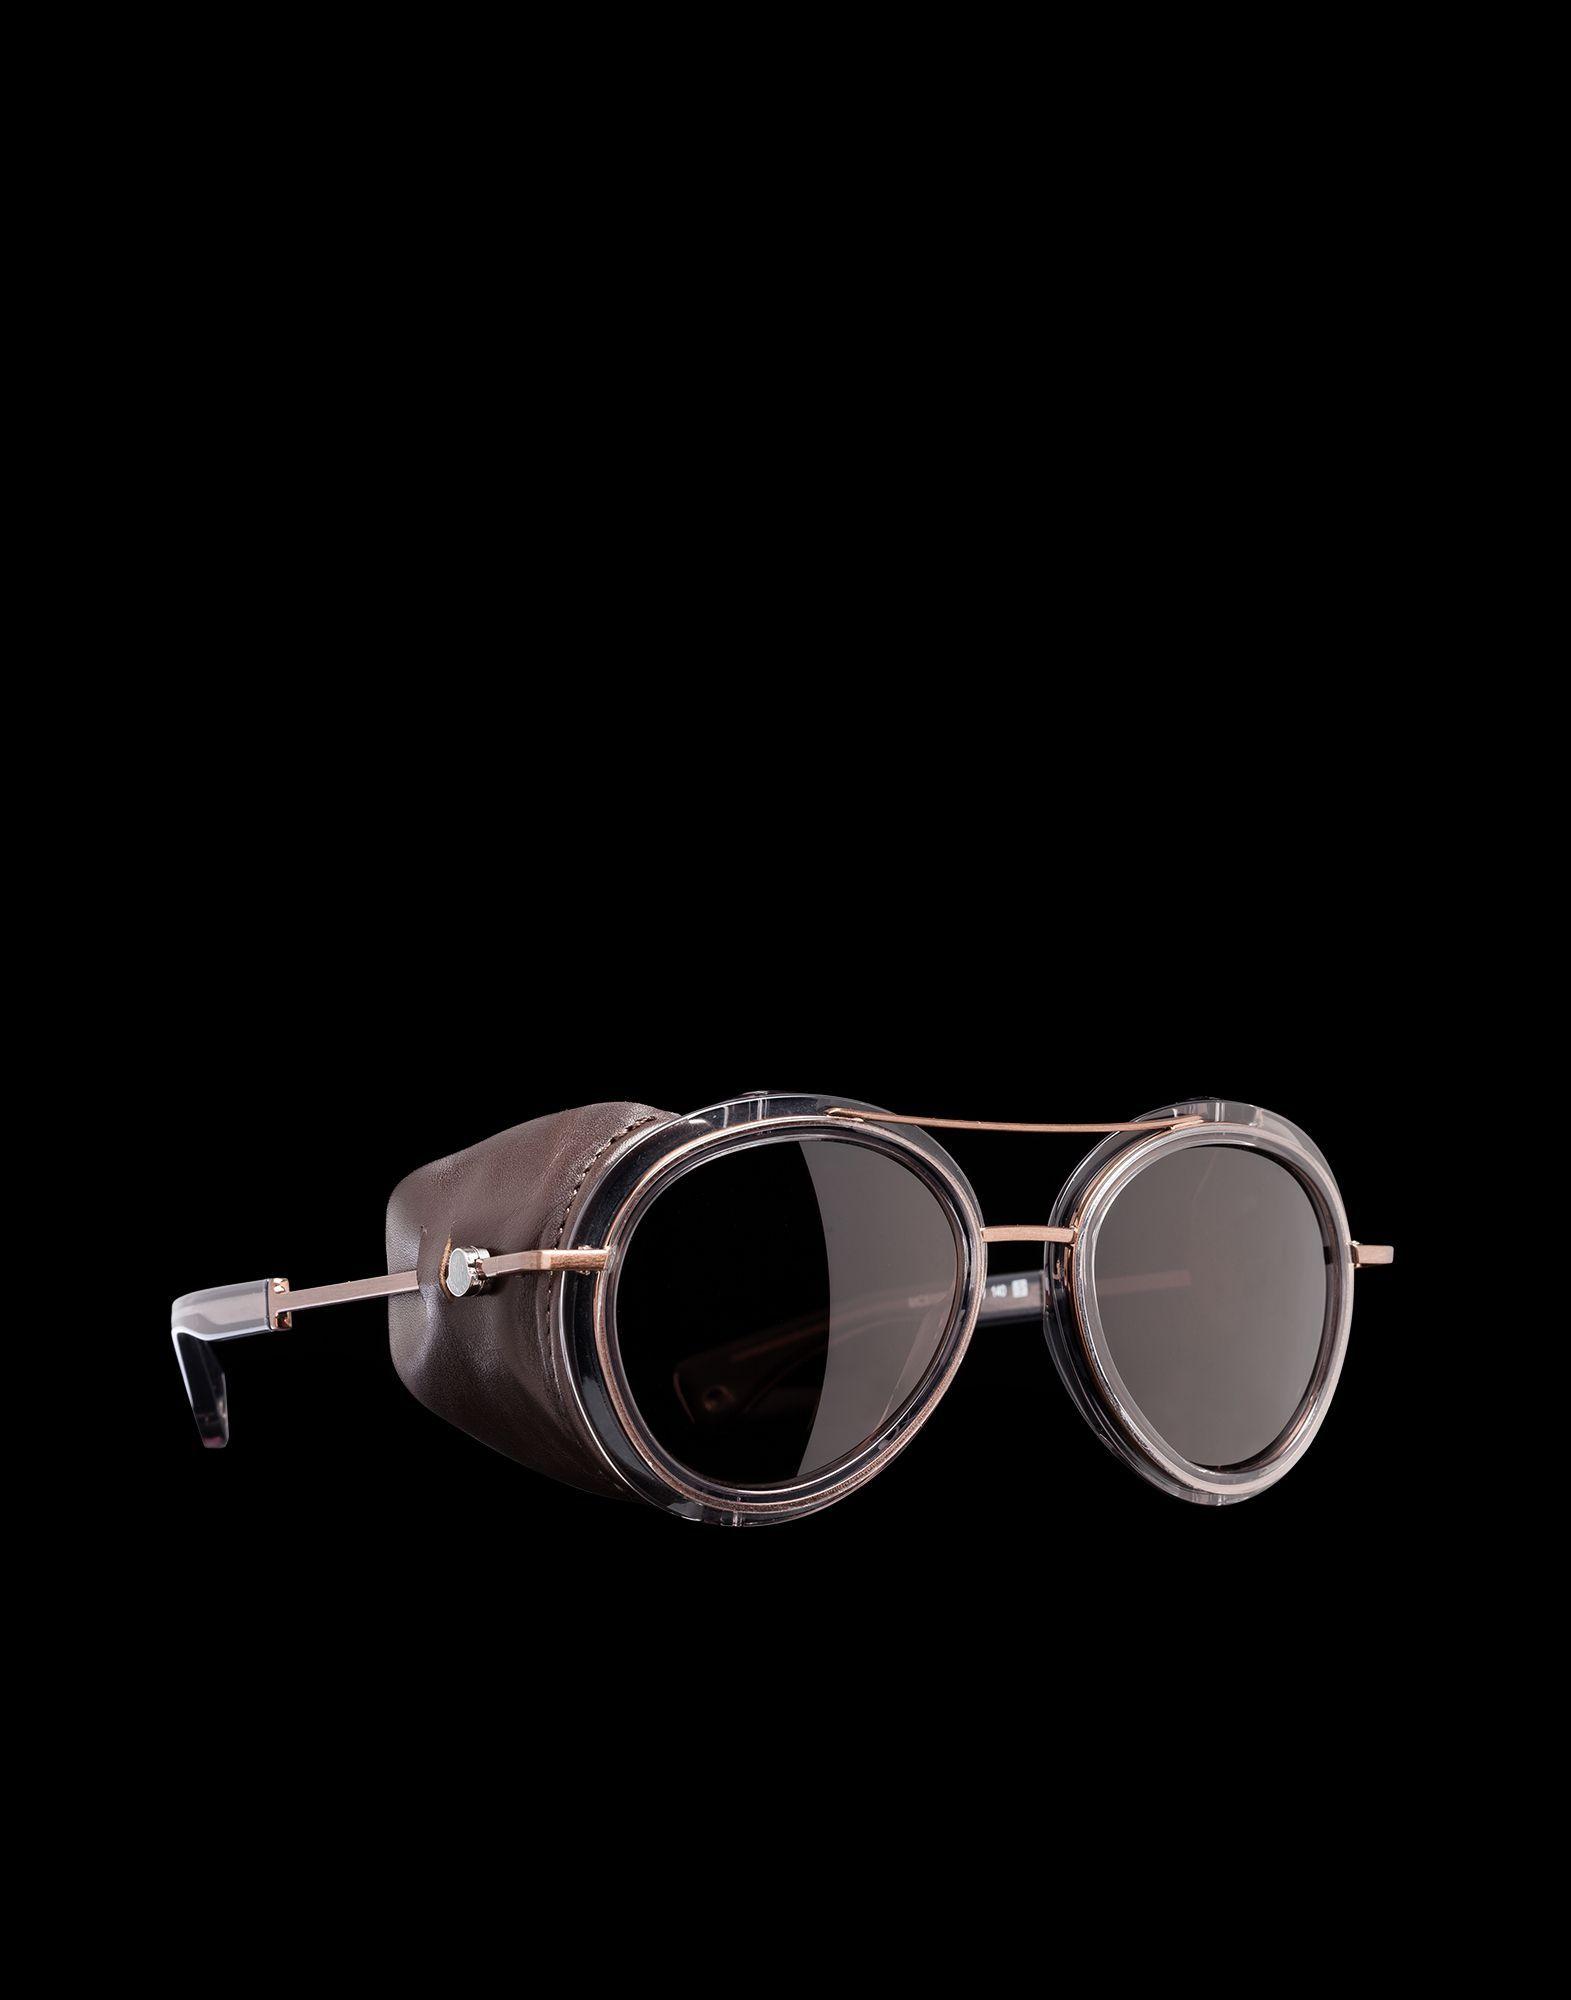 occhiali da sole uomo moncler